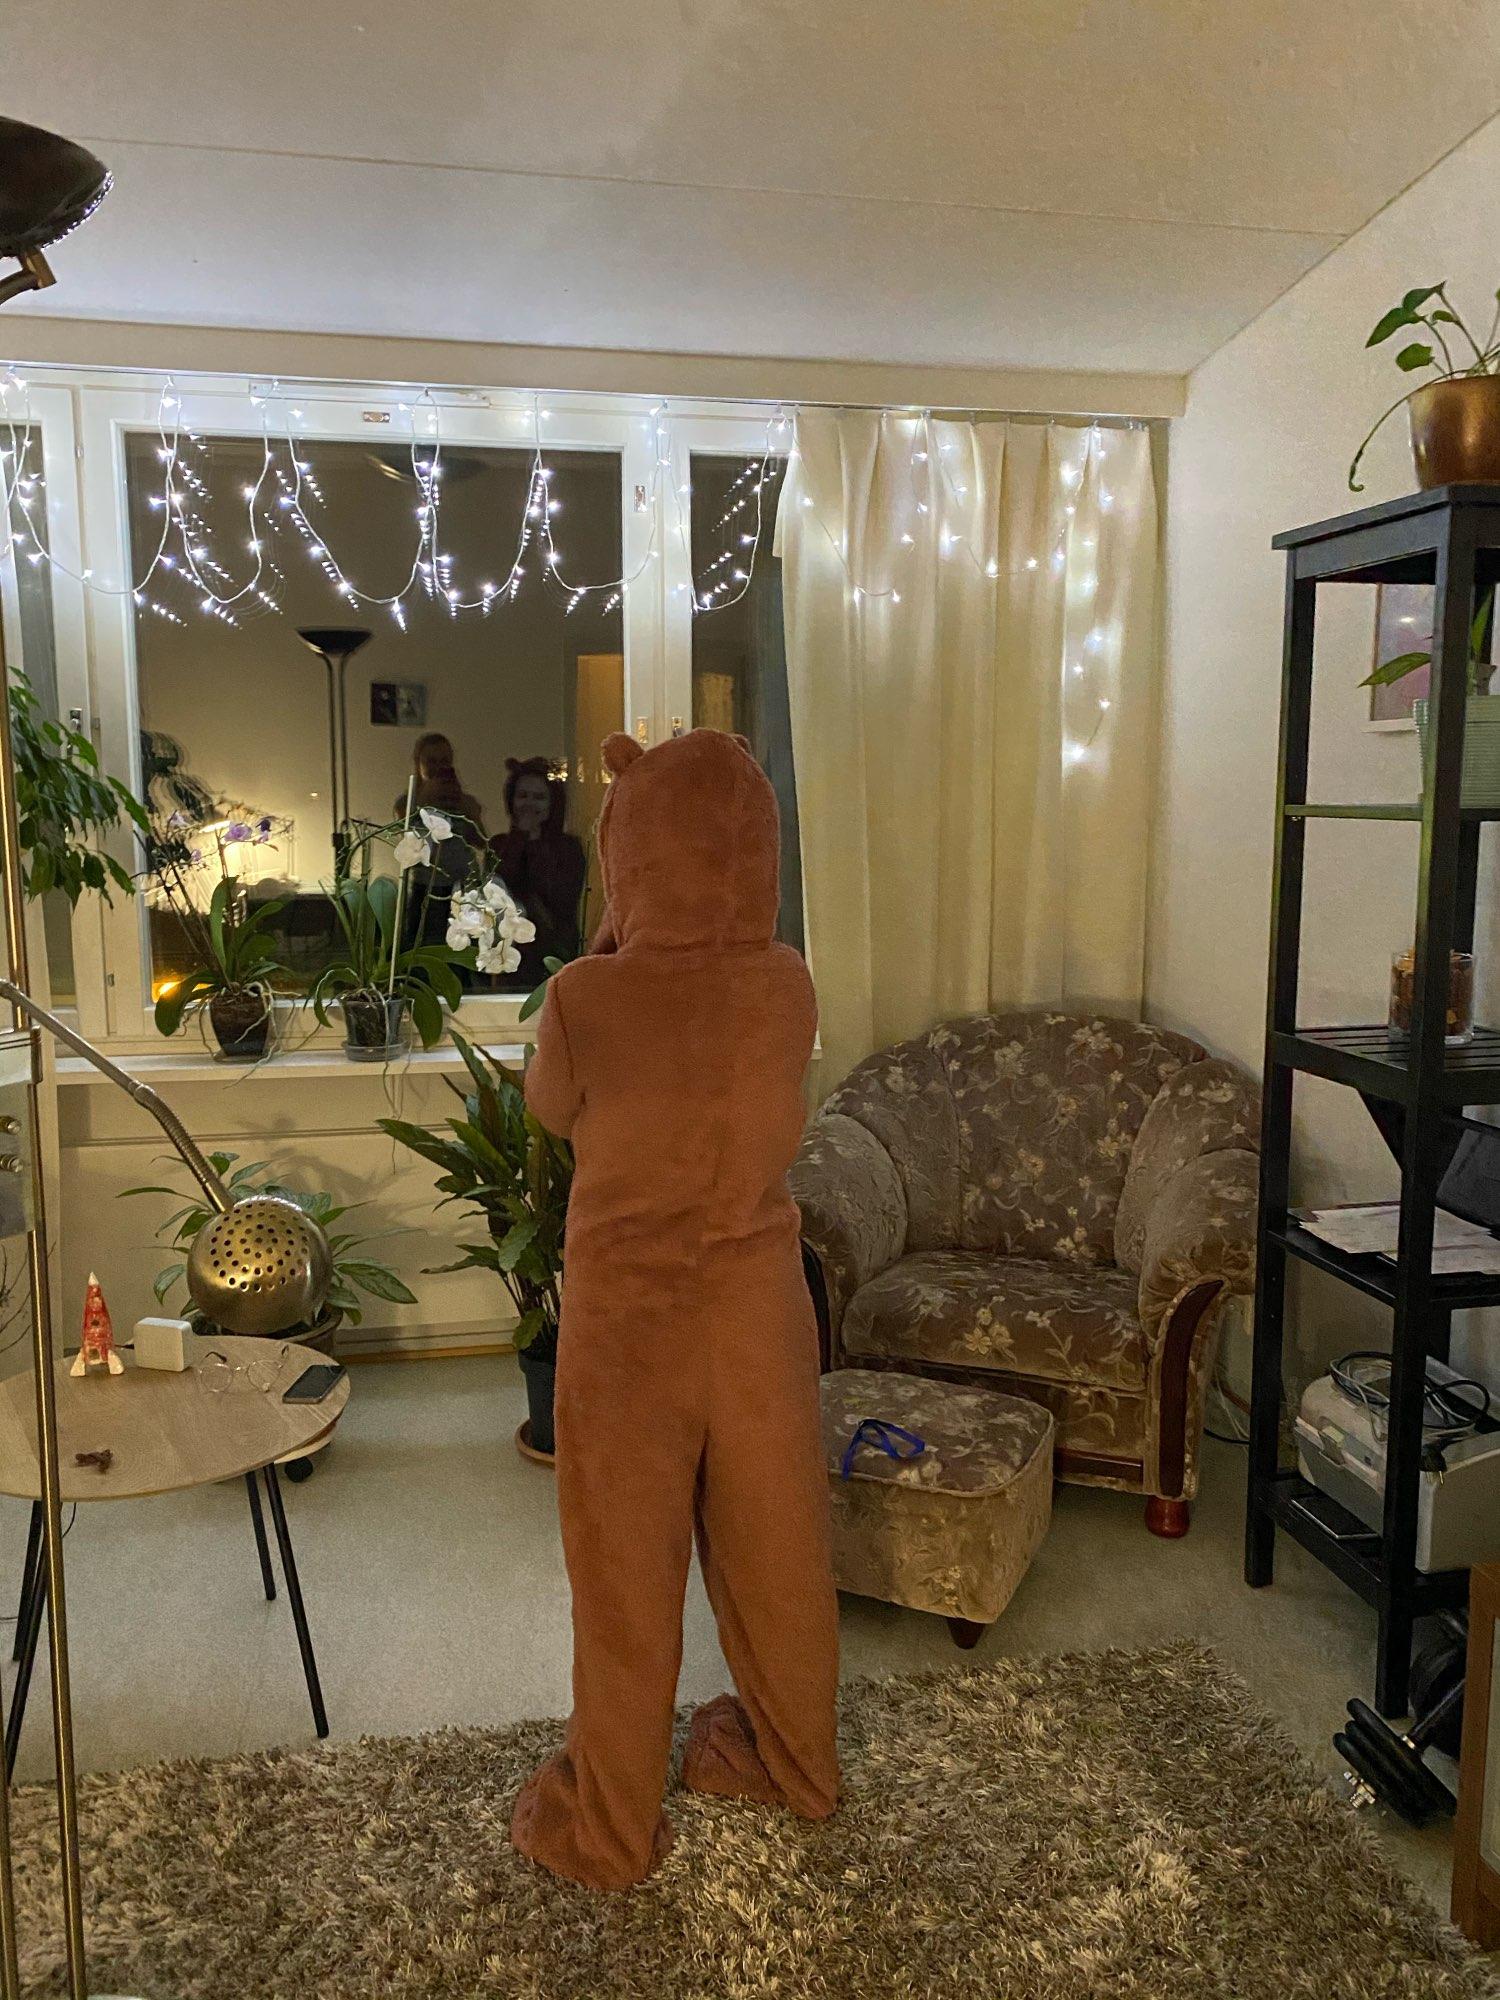 Winter Warm Furry Onesie - cossieshop photo review